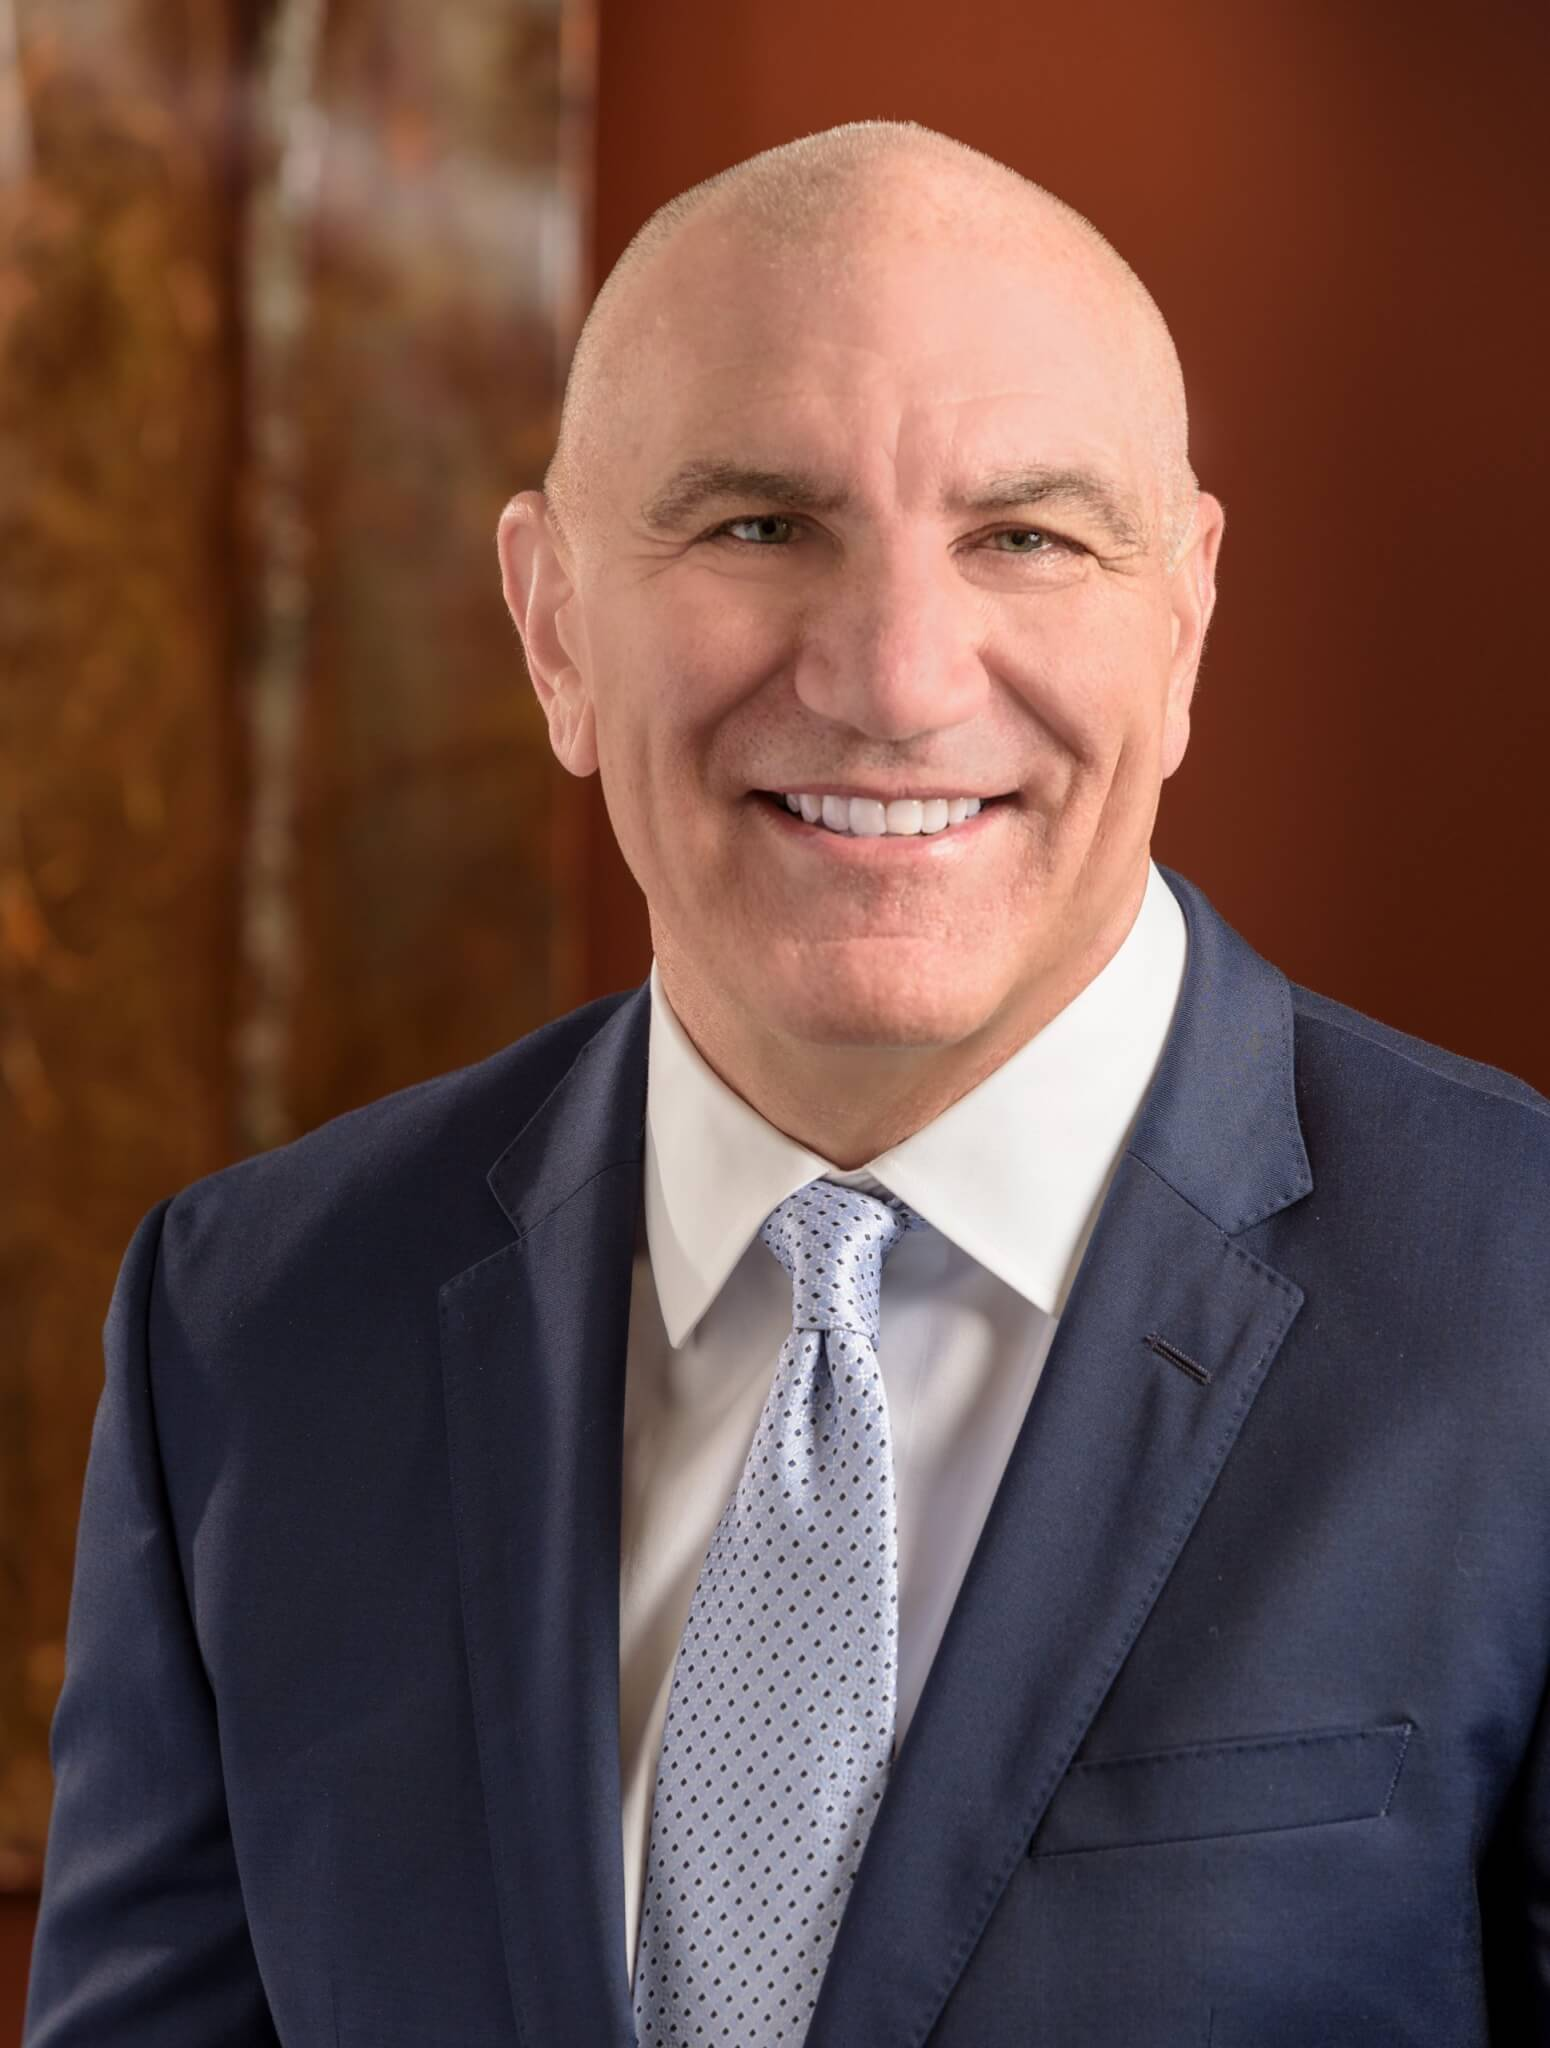 Dr. Eric Kuhn